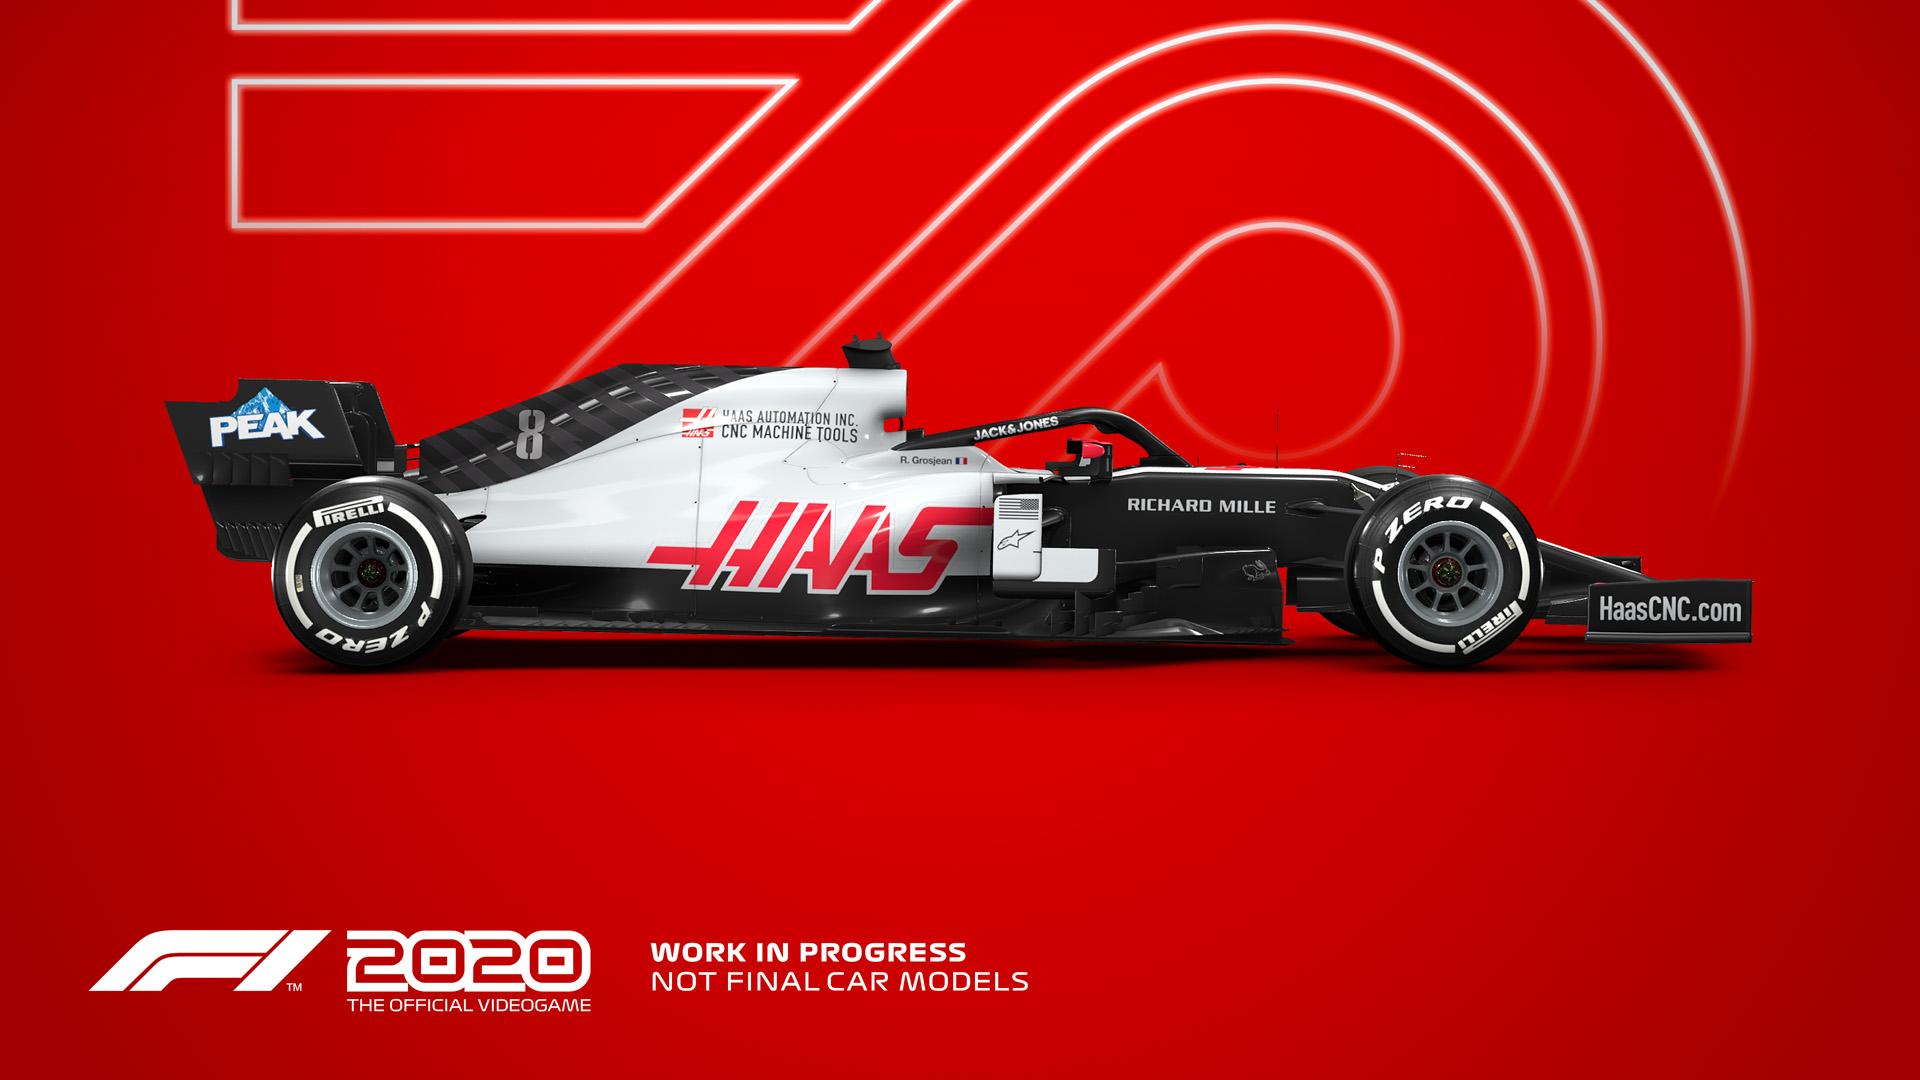 F1® 2020 Deluxe Schumacher Edition | ROW (0ad193b5-5778-47b5-b069-f16a13be9d0d)